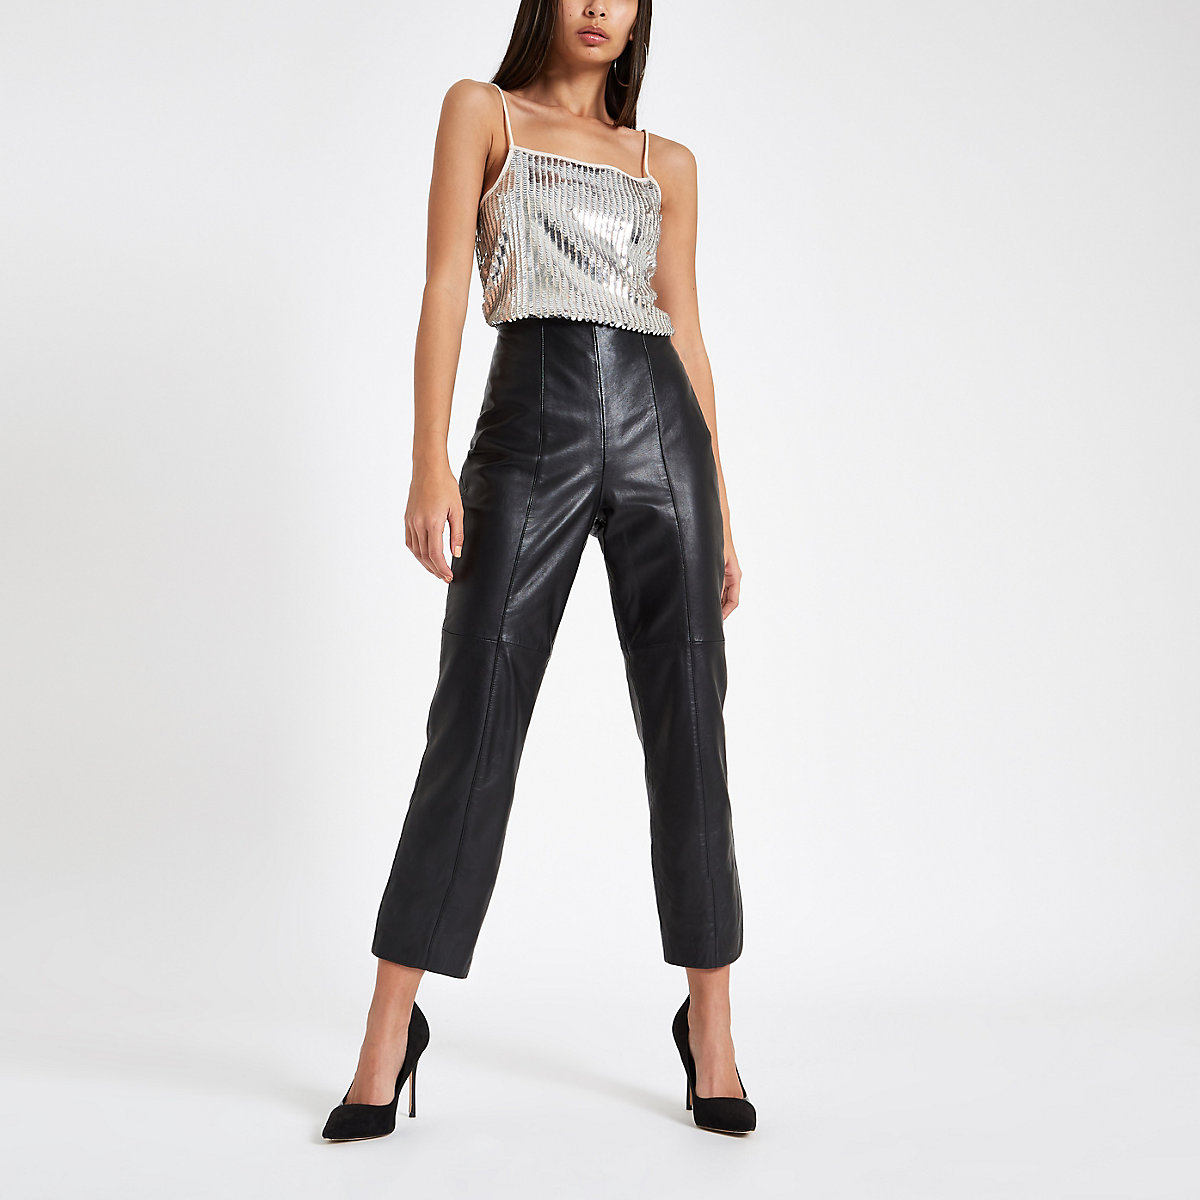 Silver sequin cami top